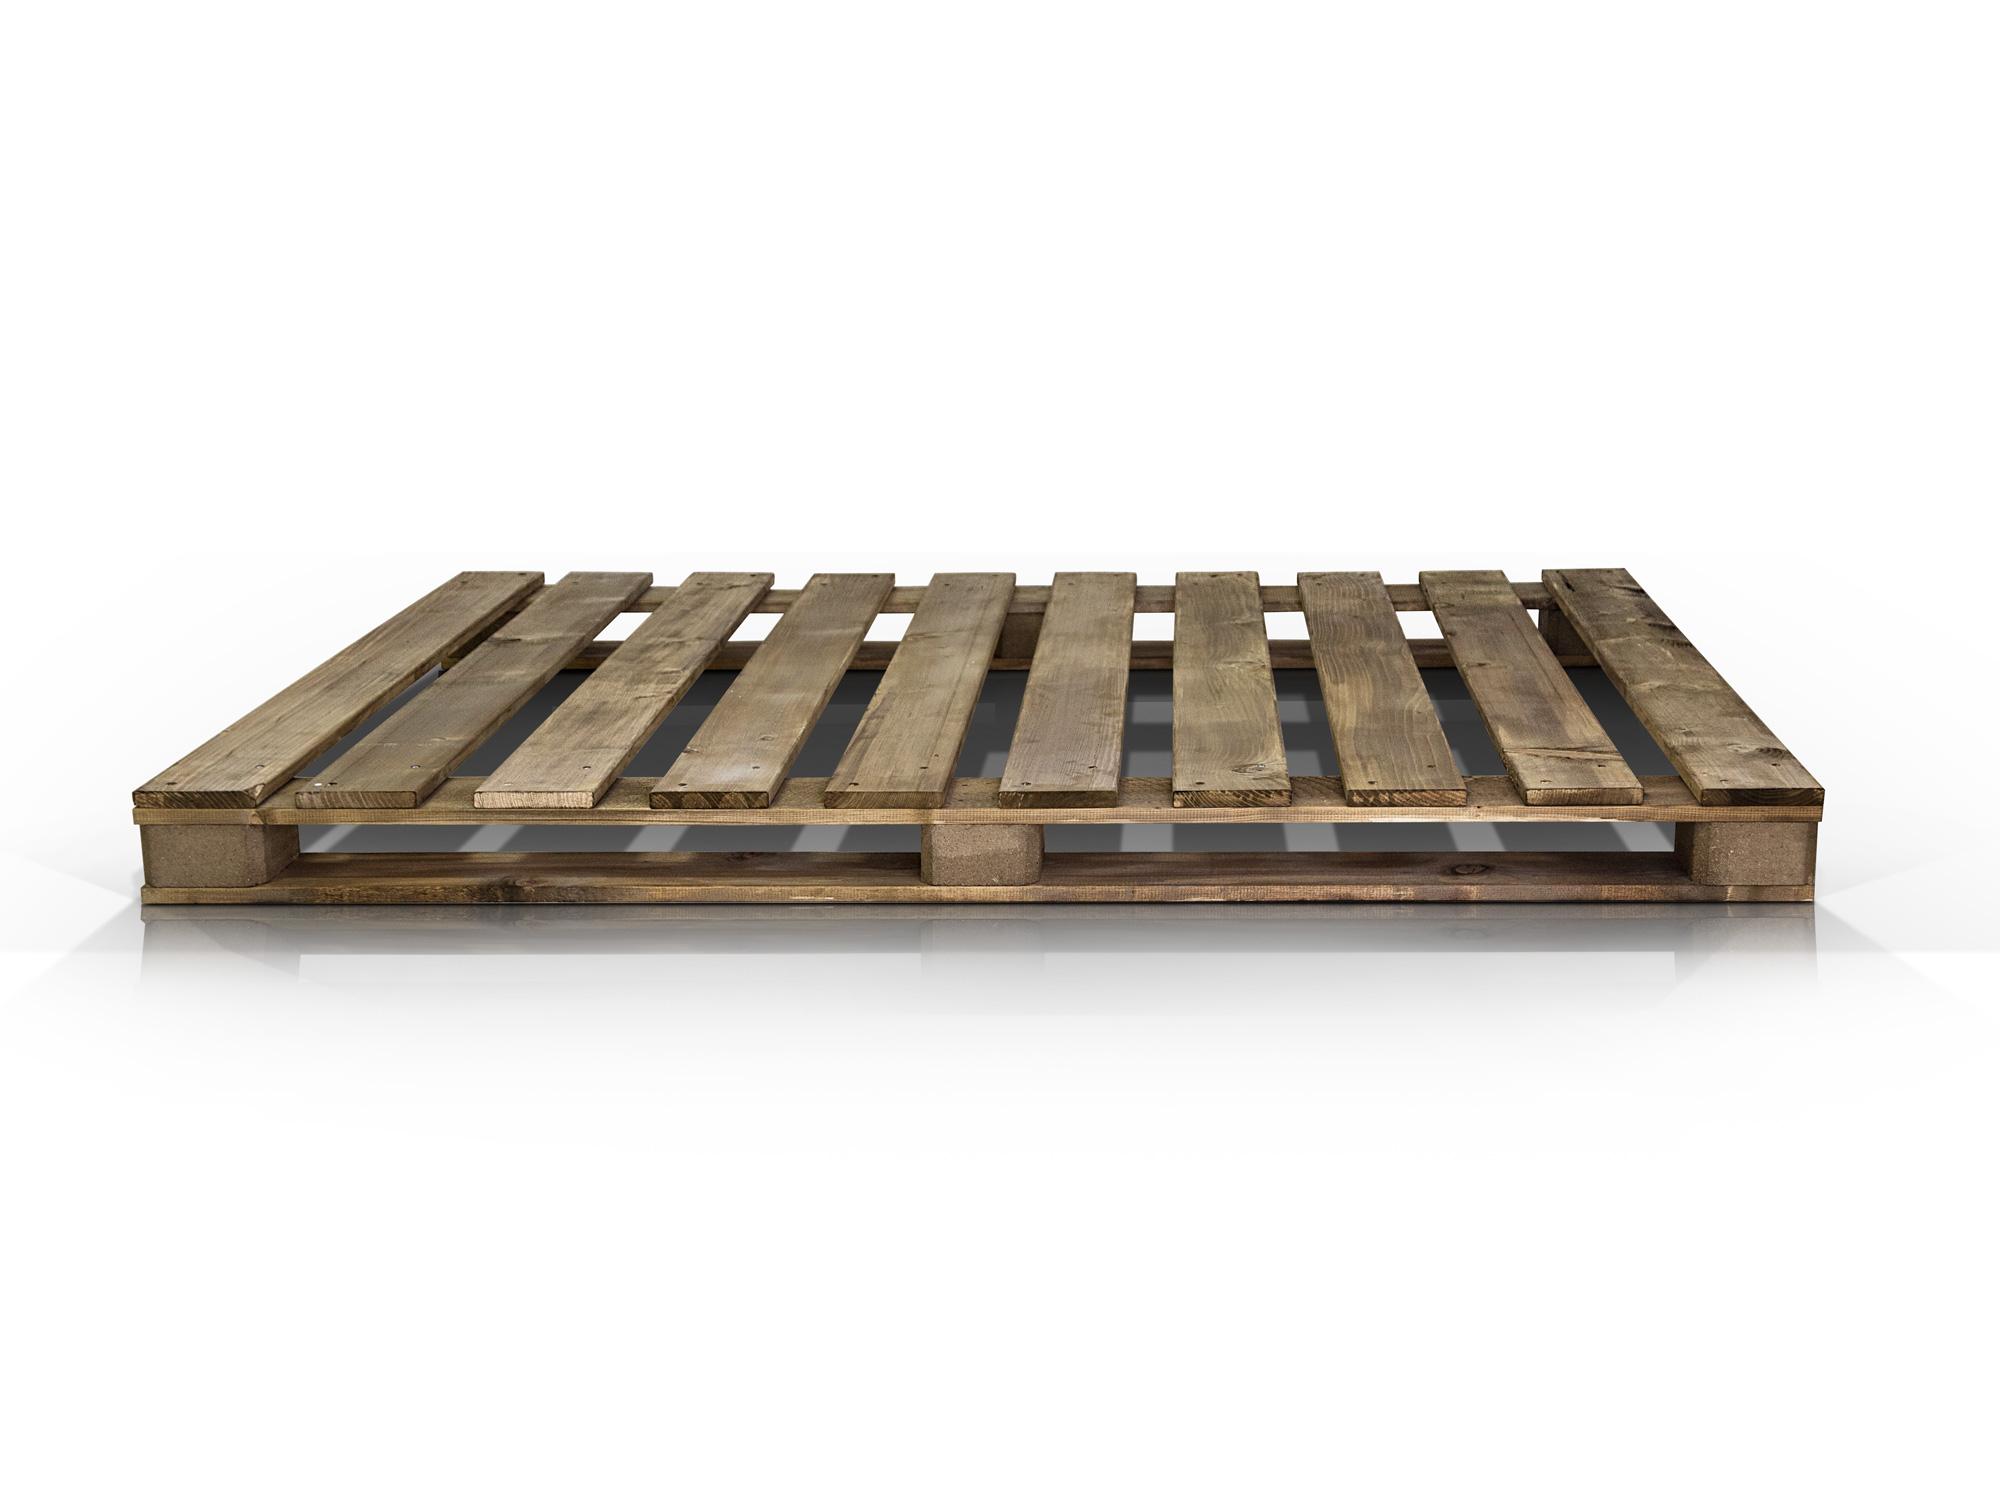 Paletti massivholzbett aus paletten rustikal gebeizt 120 x 200 cm